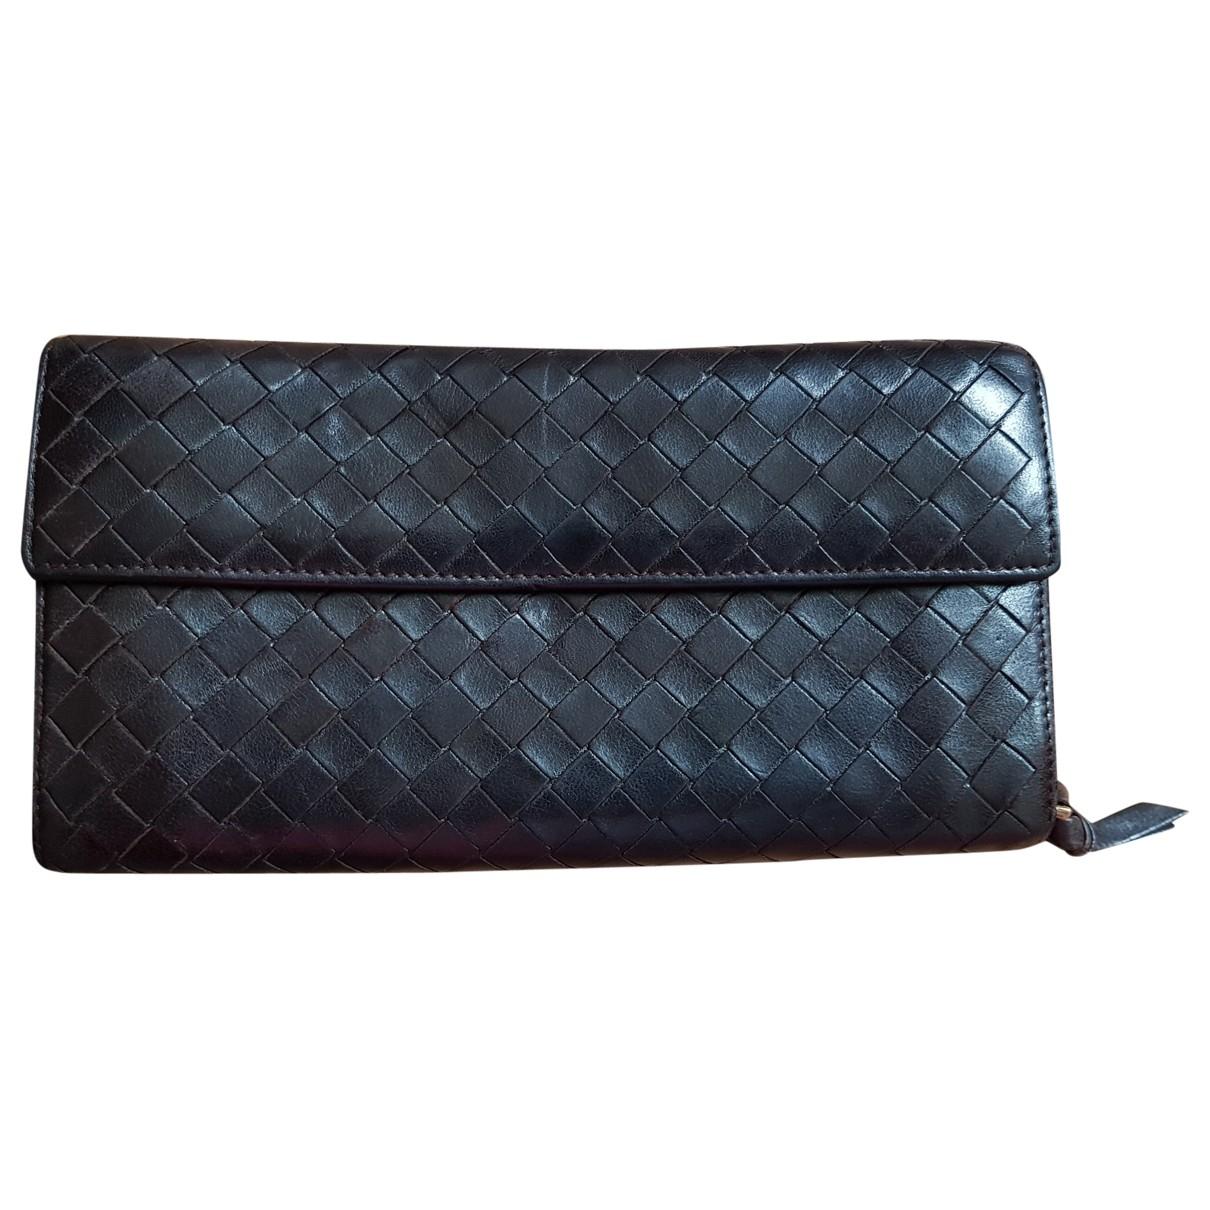 Bottega Veneta \N Brown Leather Small bag, wallet & cases for Men \N